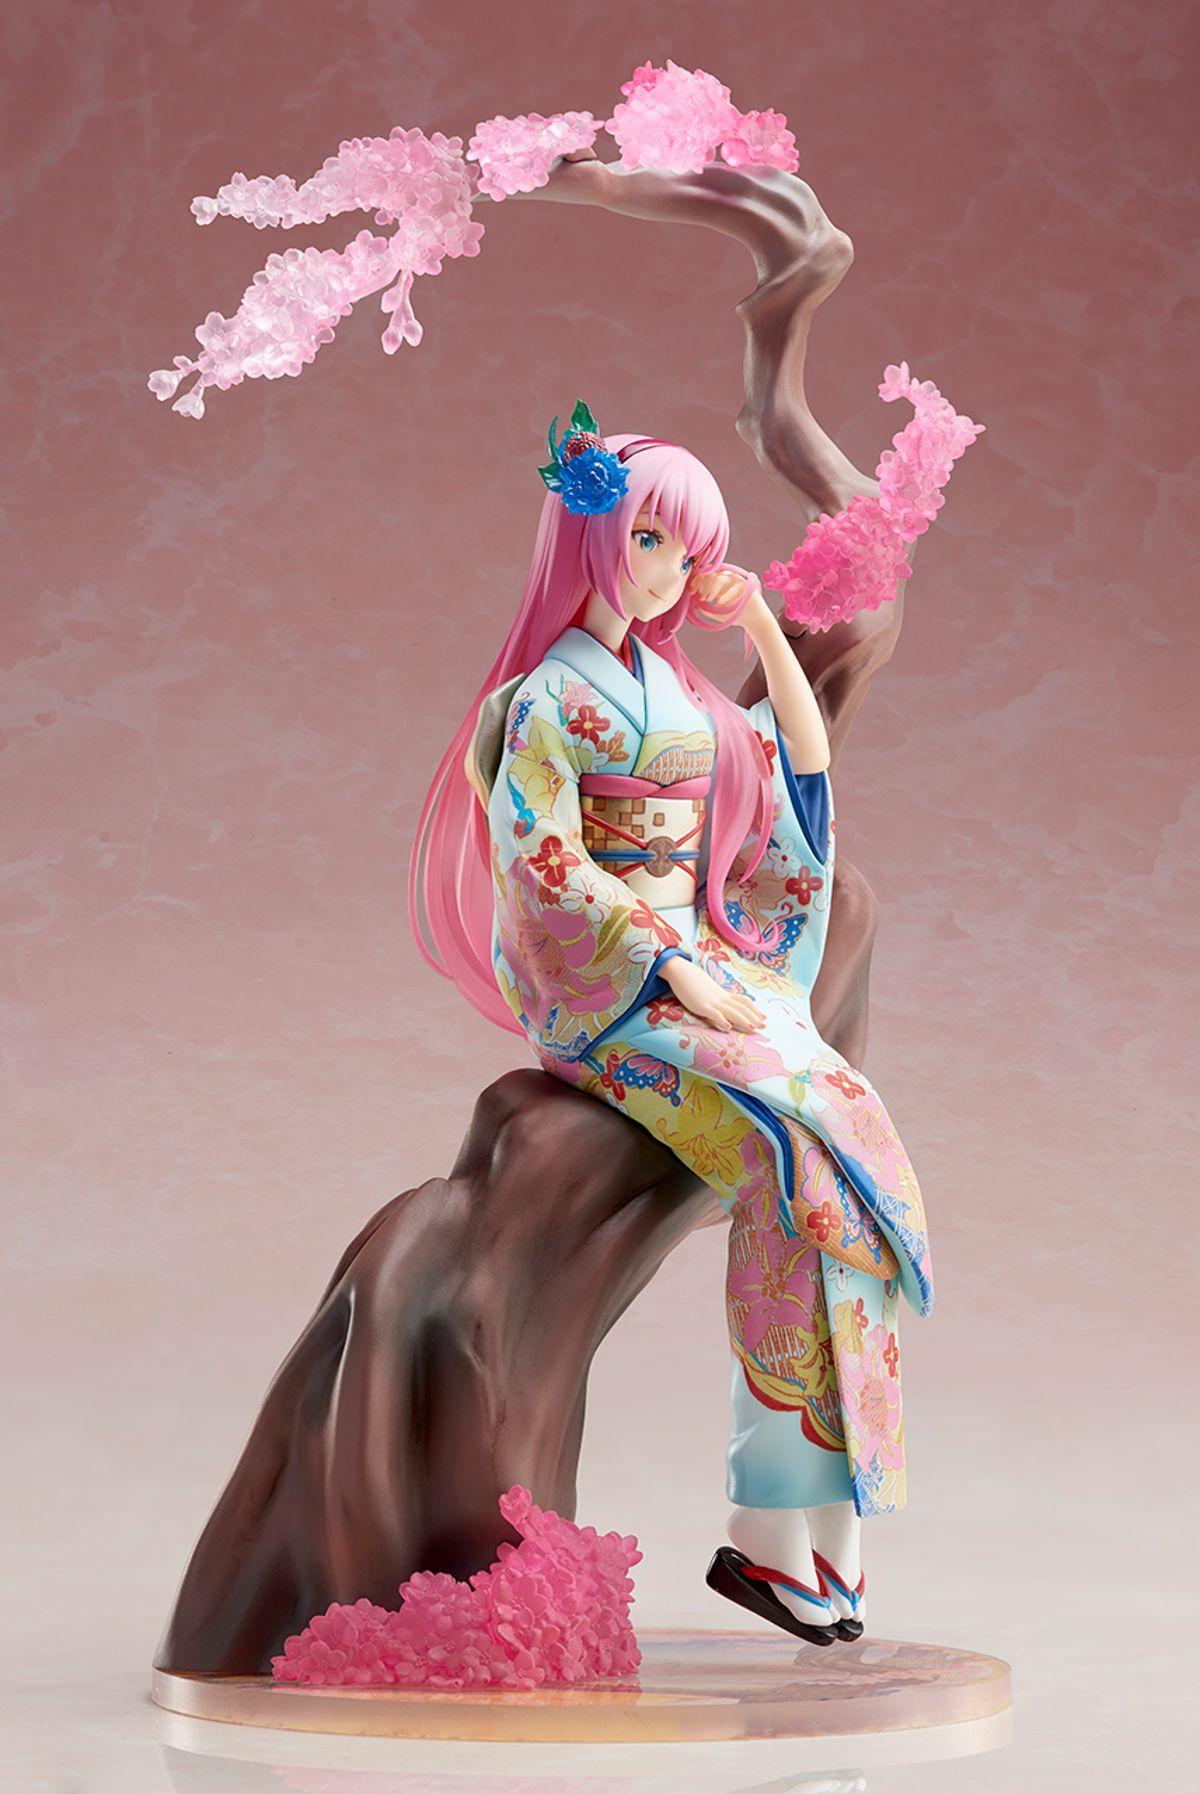 25cm Hatsune Miku Megurine Luka muñeco de Anime figura juguete de modelo de colección figura de acción para regalo de amigos